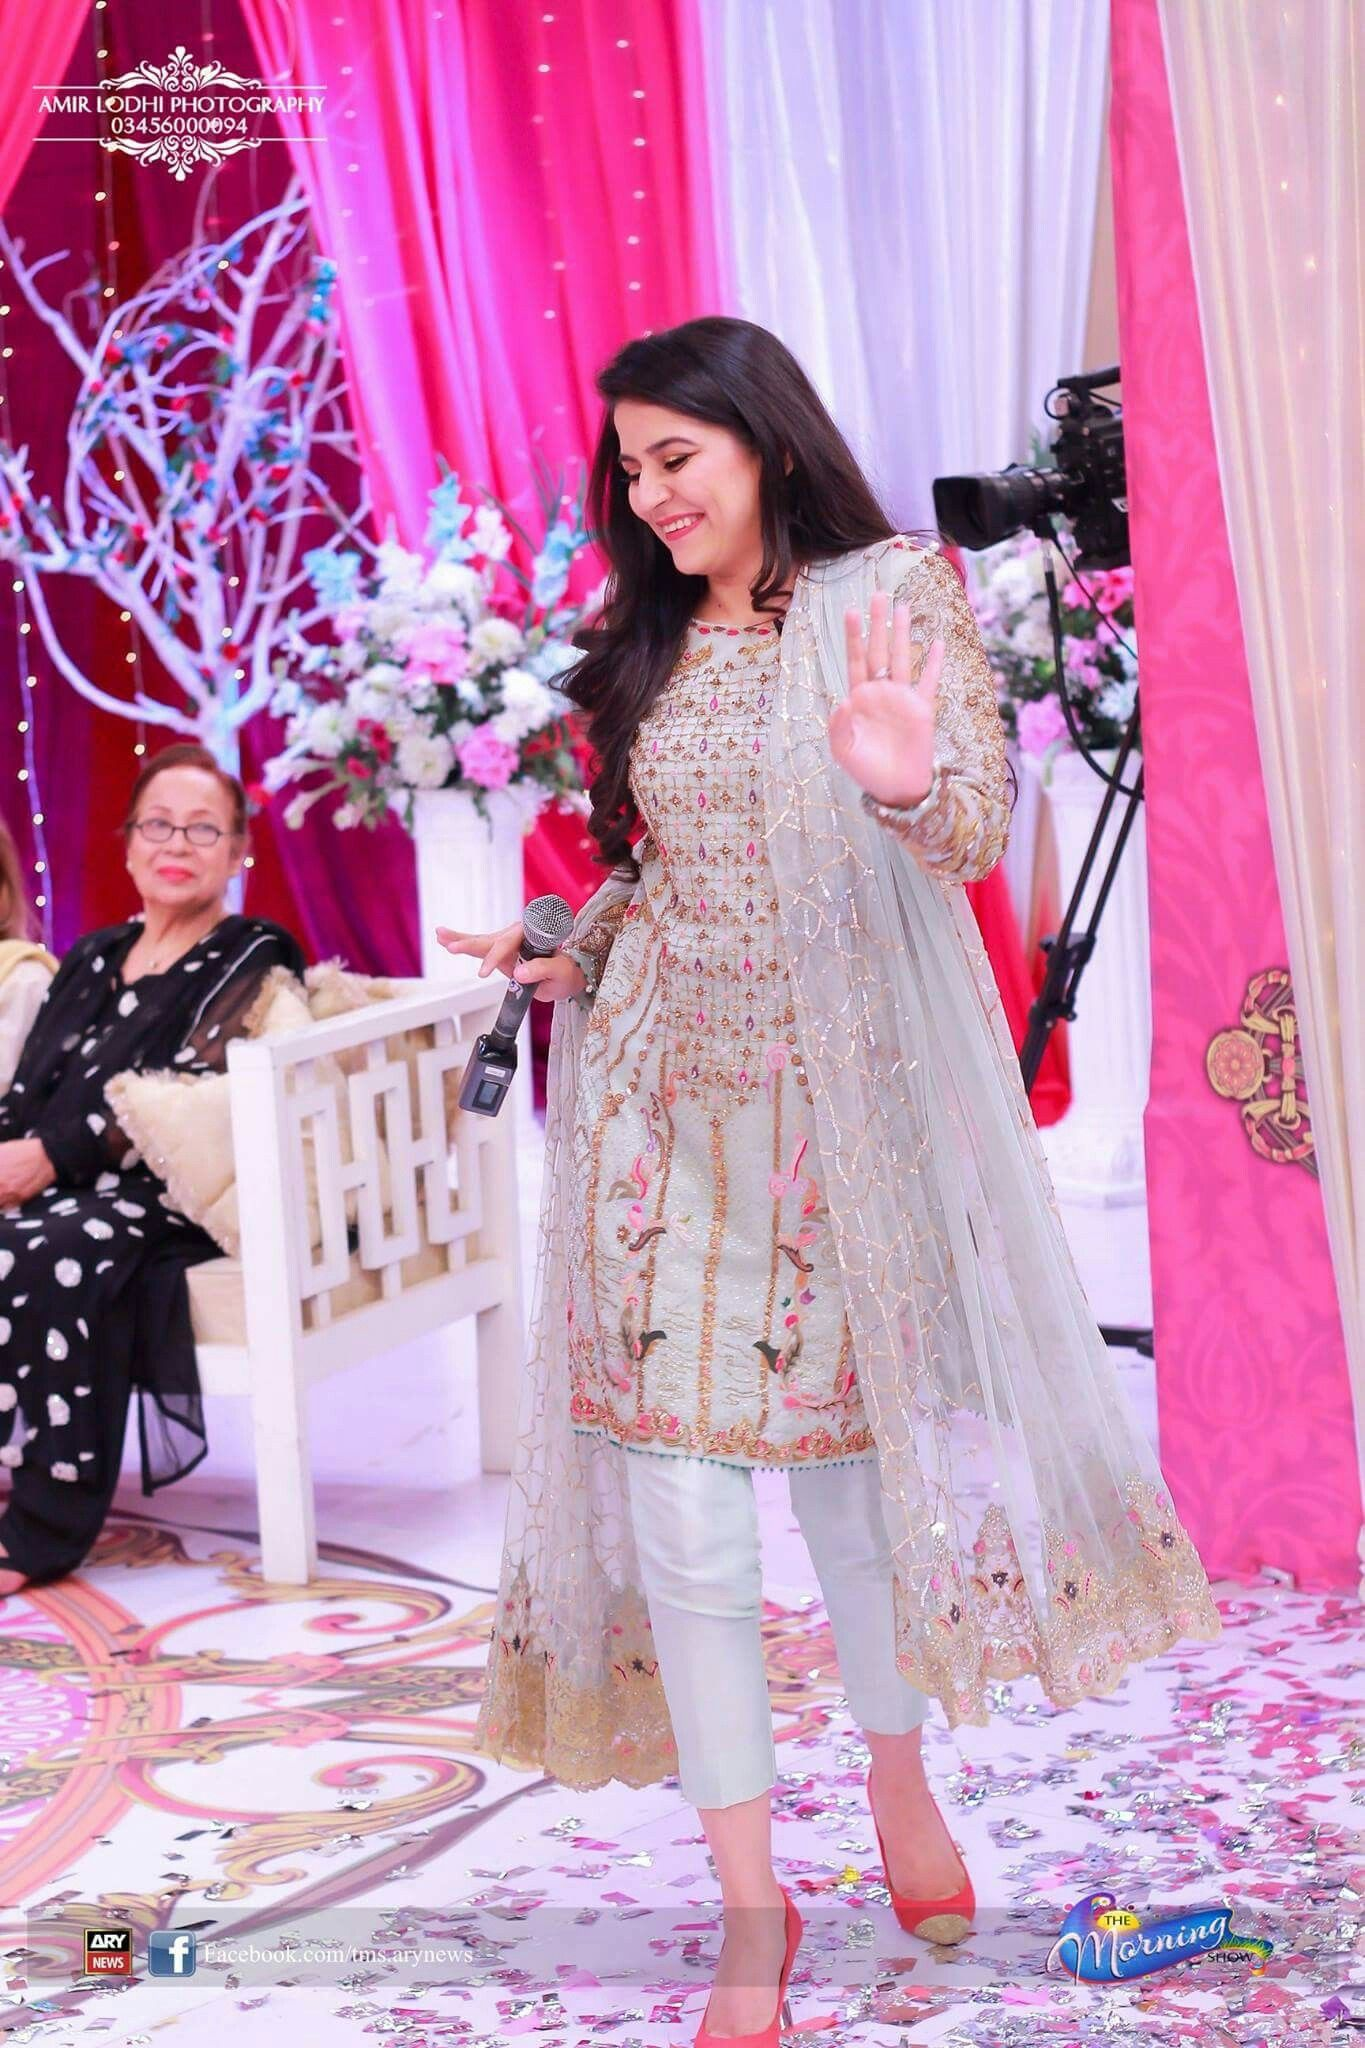 Pin de mishi khan en Fashion world | Pinterest | Vestiditos